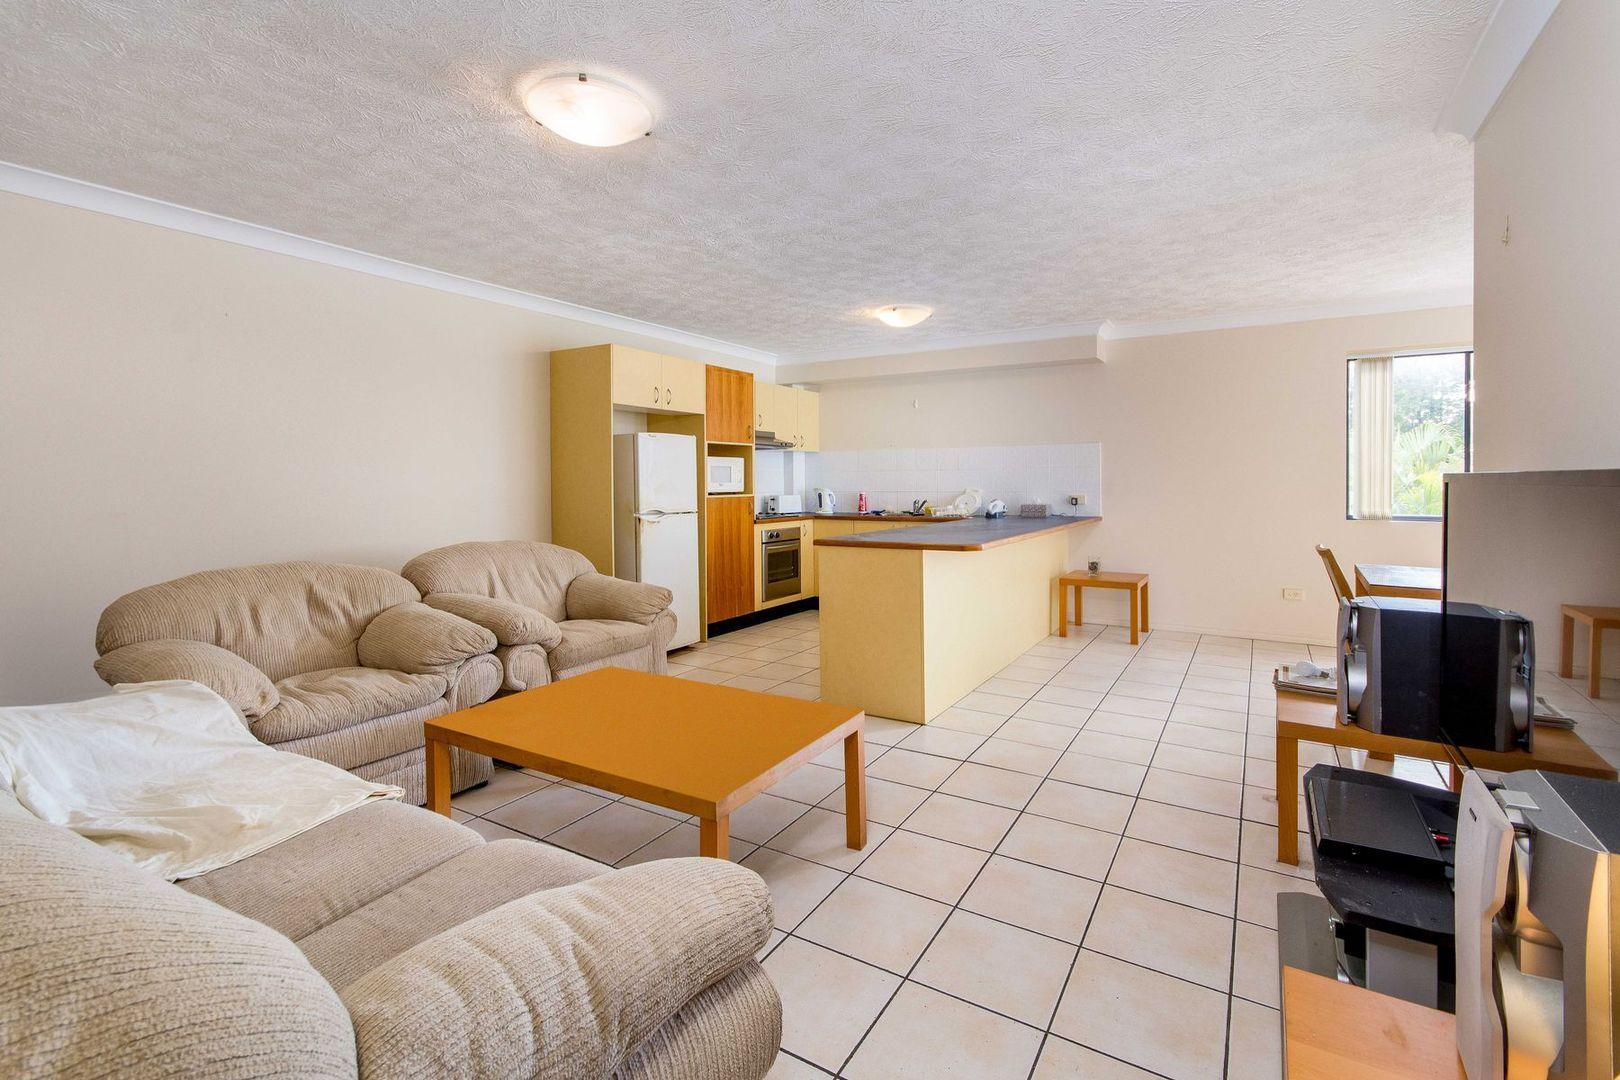 6/54 Winston Drive, Bongaree QLD 4507, Image 0